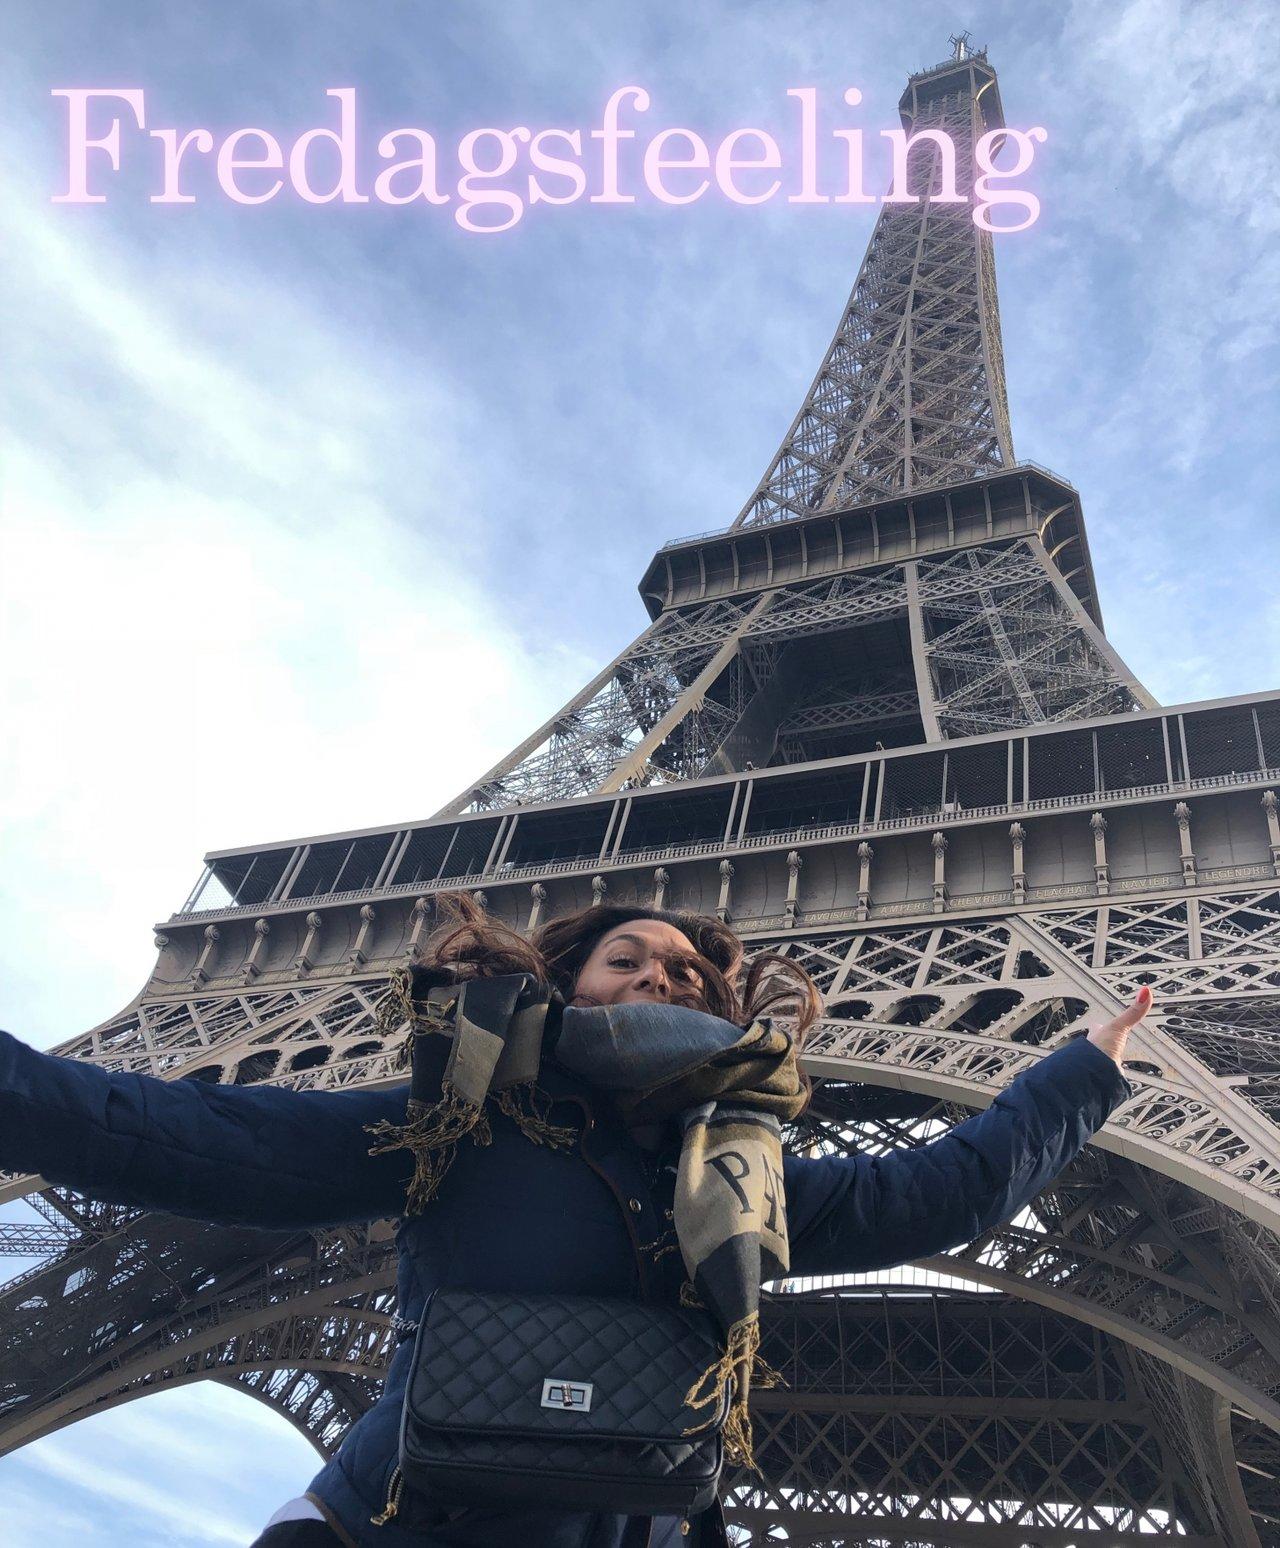 fredag_friday_blogg_influencer_bloggare